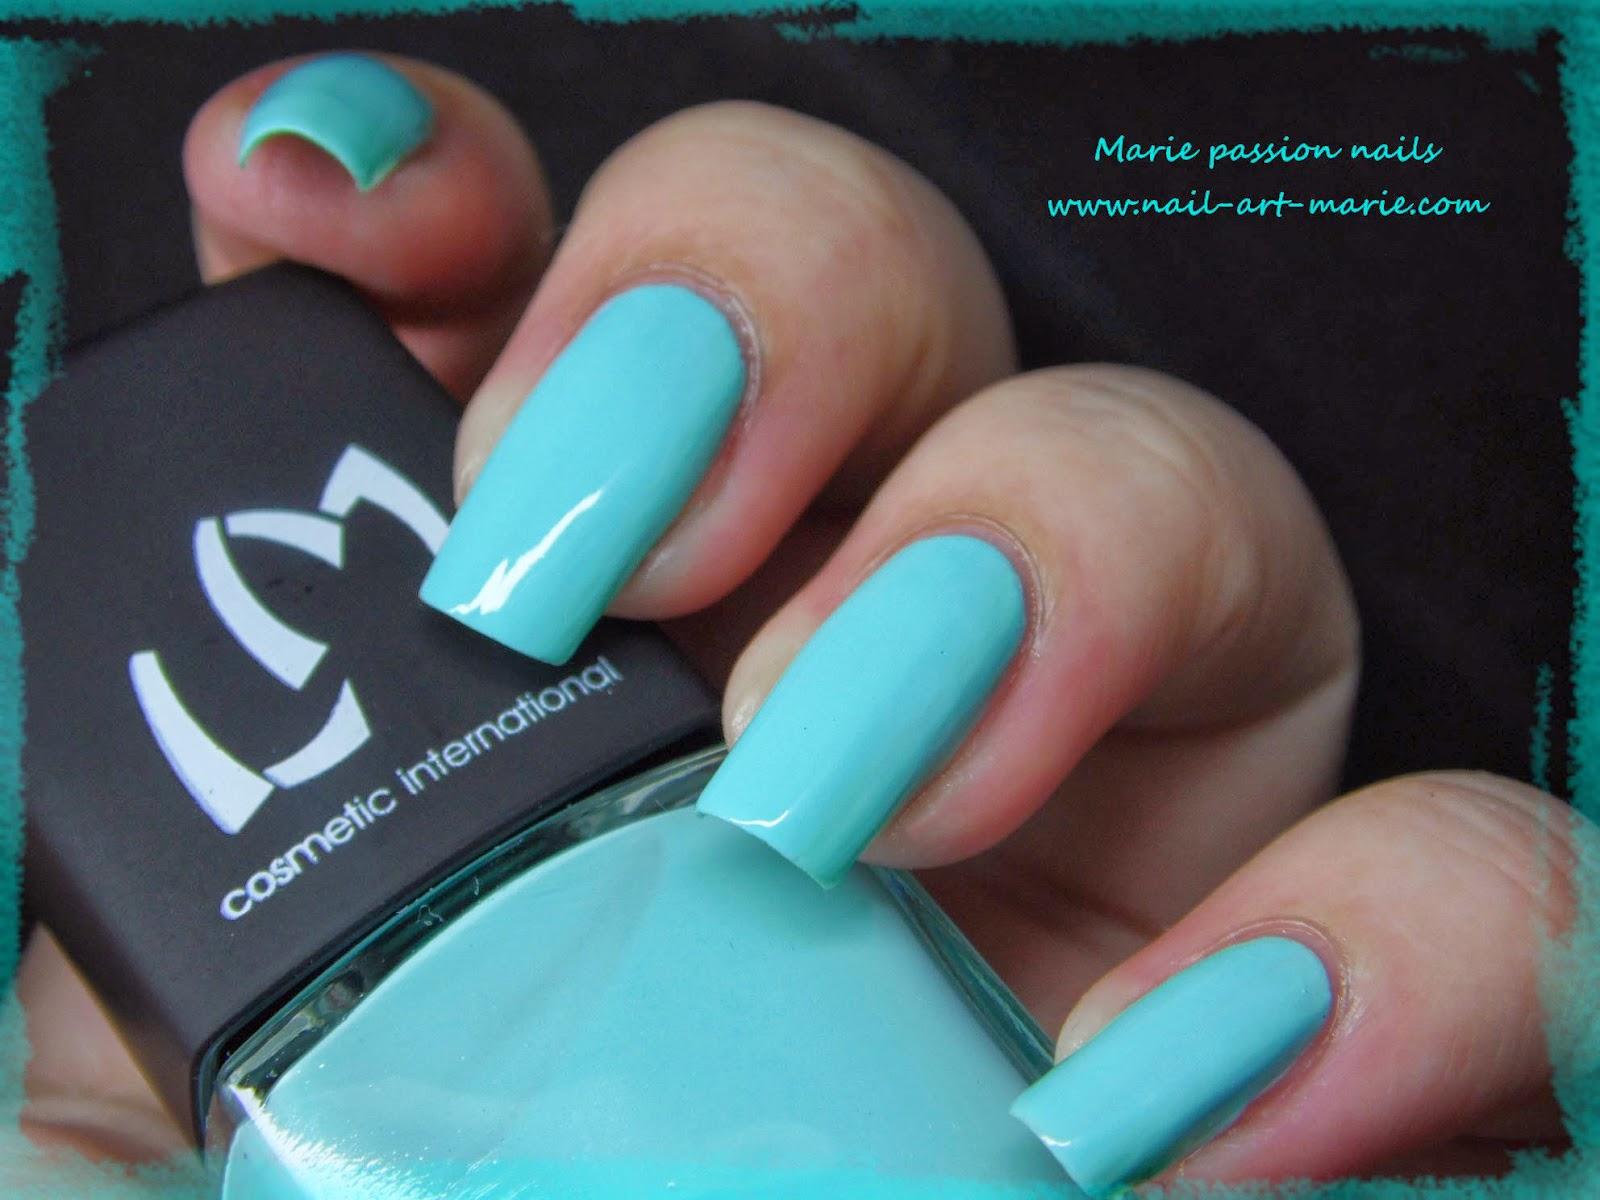 LM Cosmetic Mintcream6